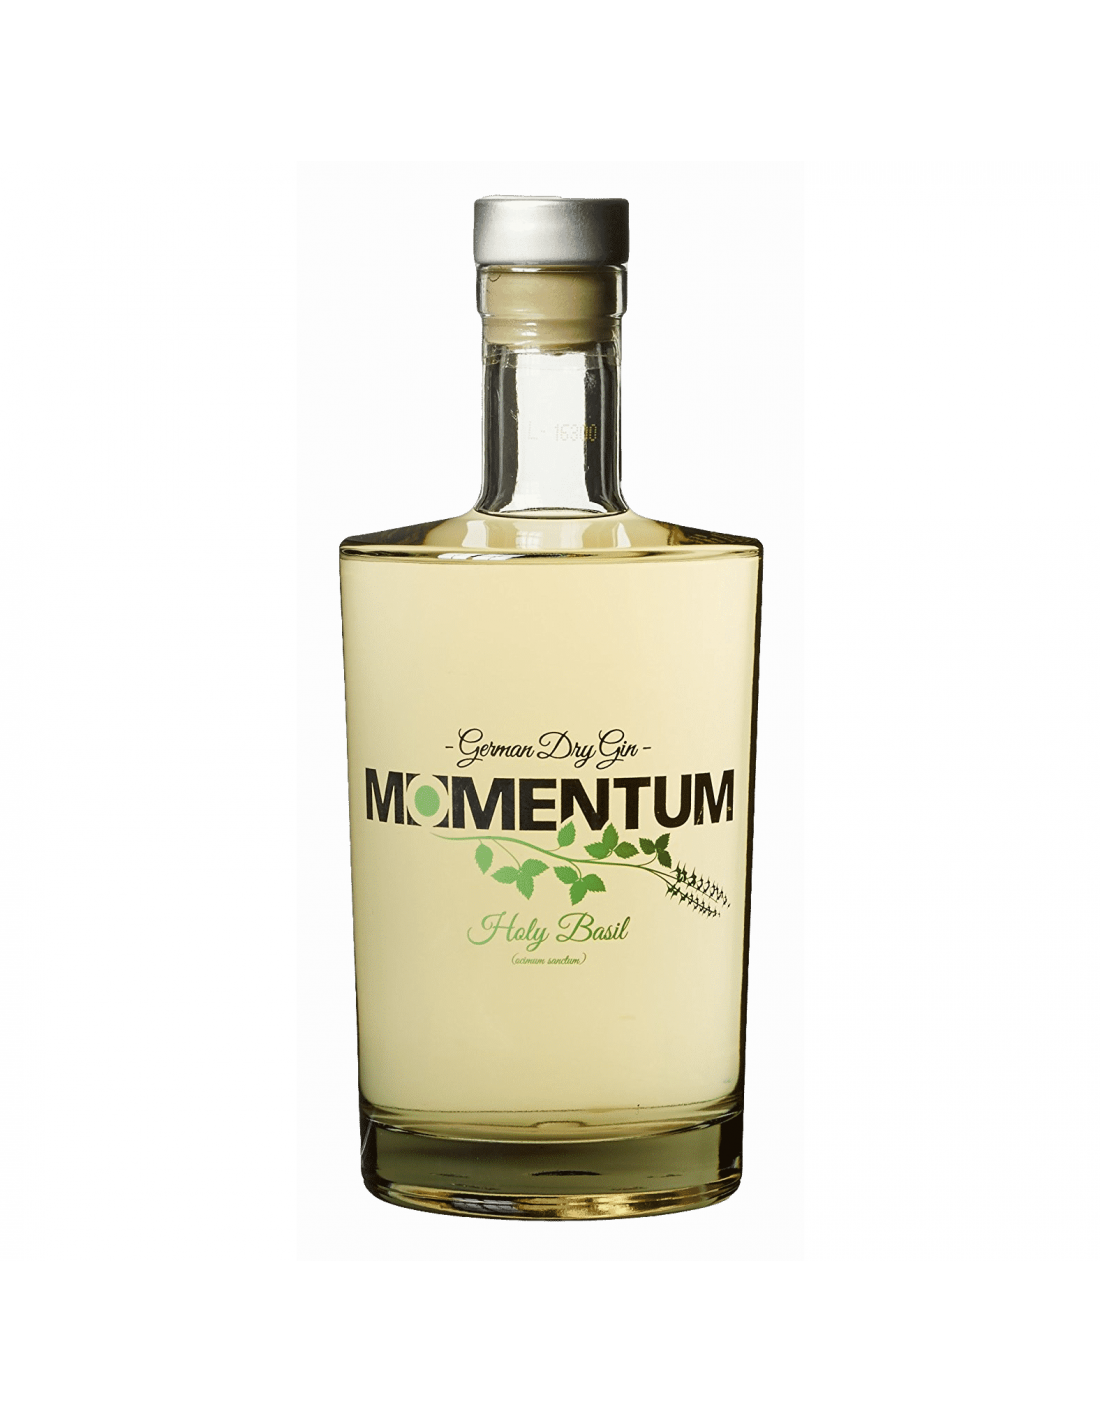 Gin Momentum 44% alc., 0.7L, Germania